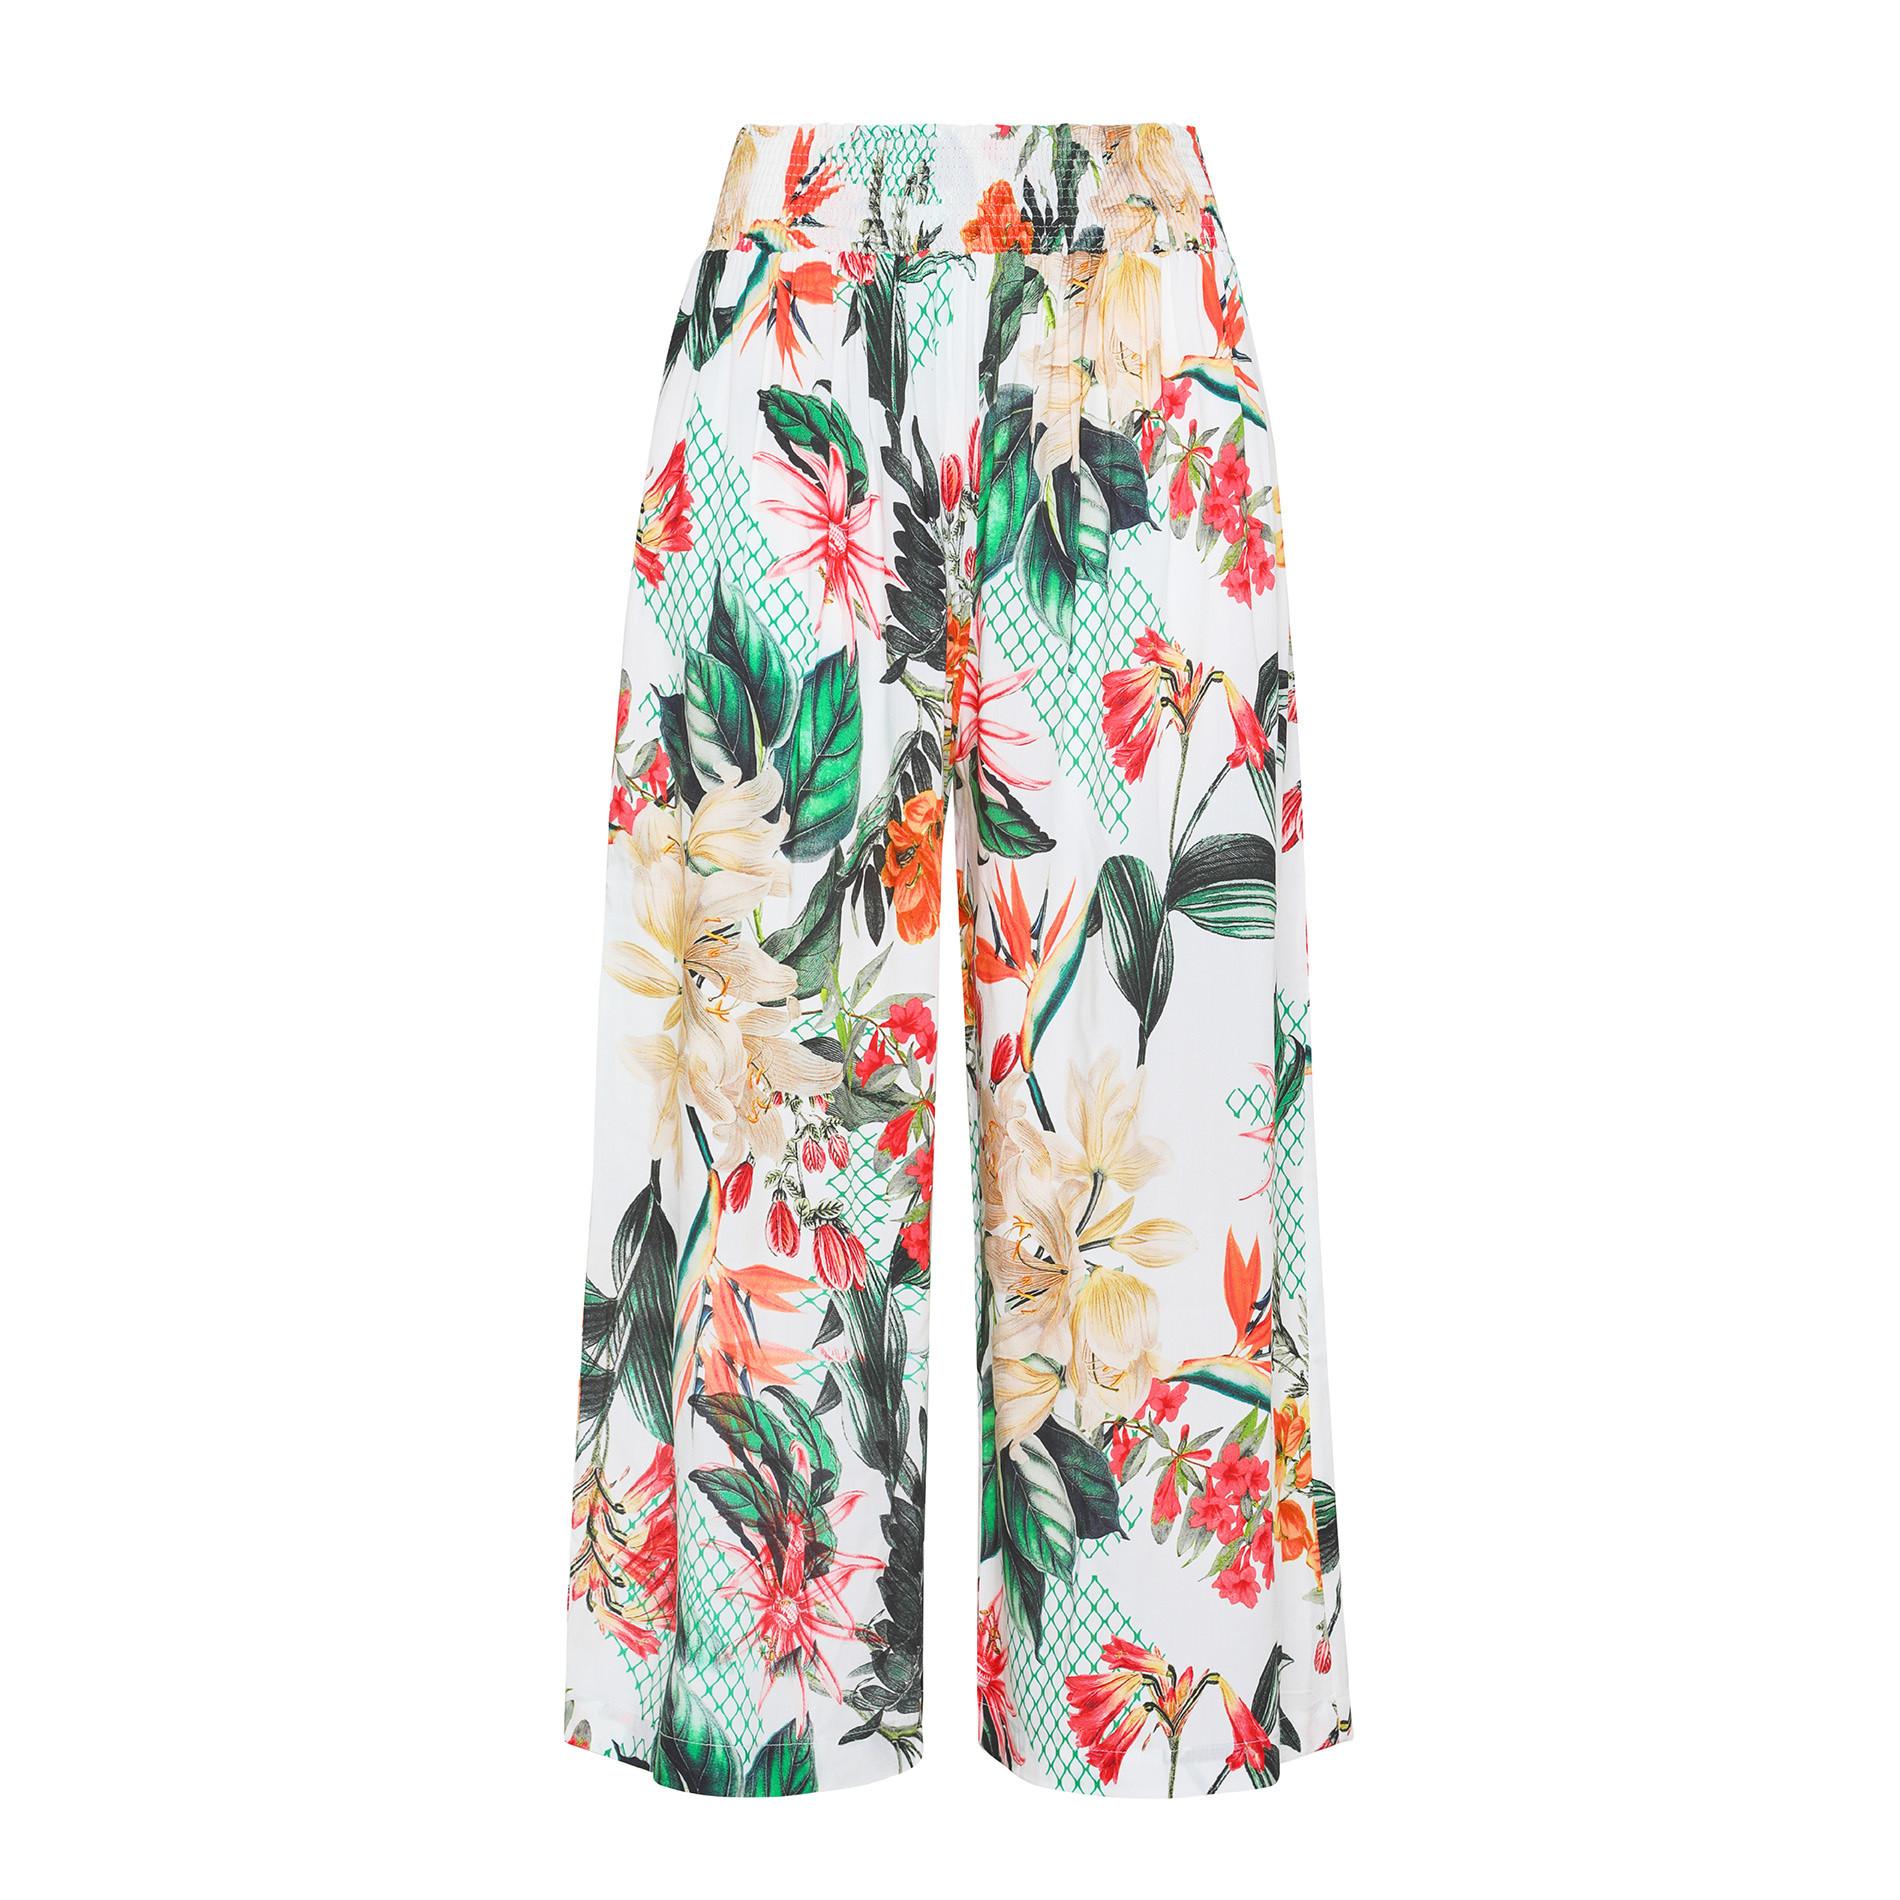 Pantalone ampio in viscosa stampa floreale, Multicolor, large image number 1